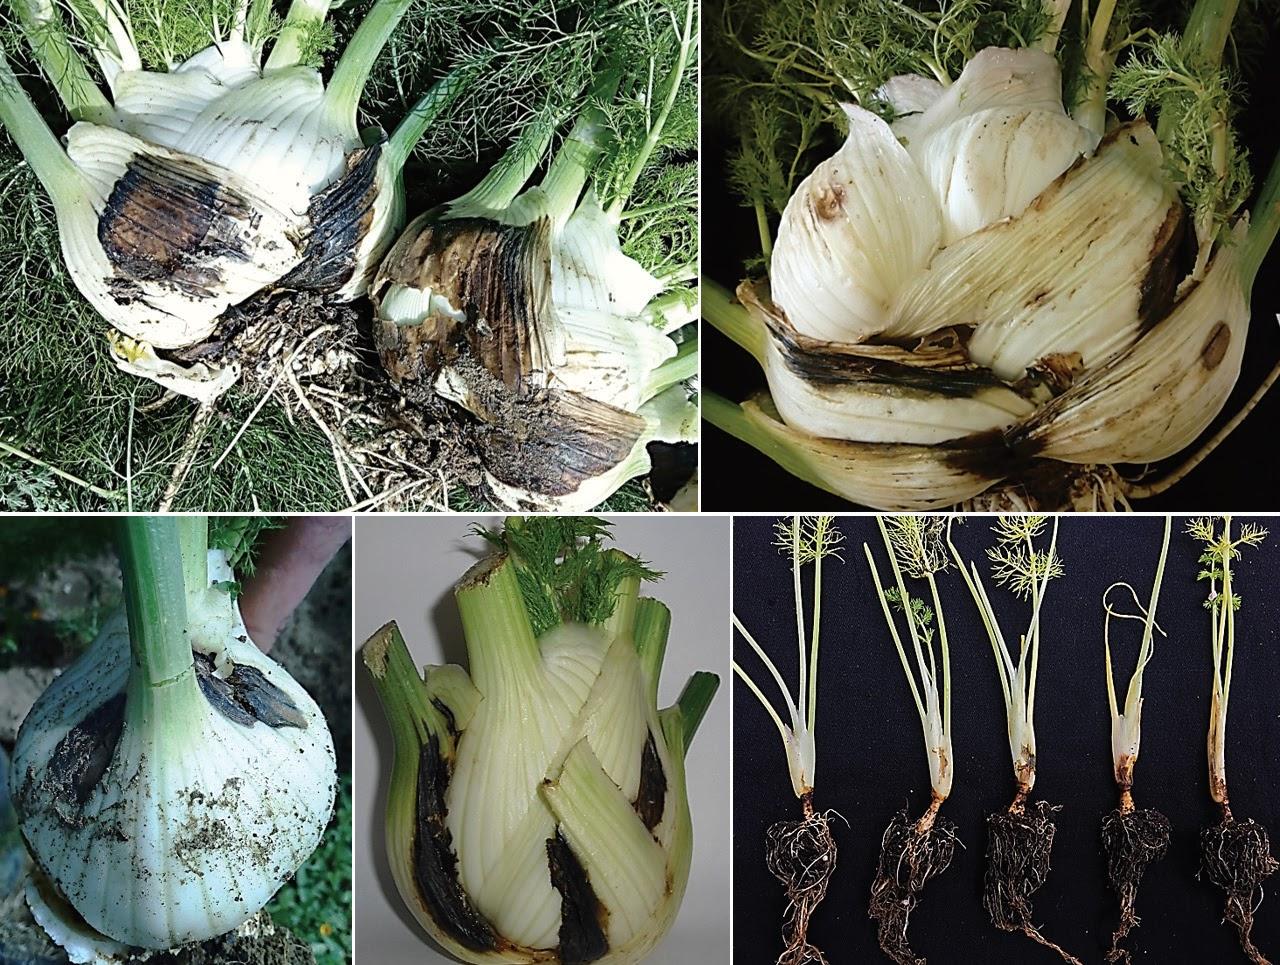 Symptoms caused by Ochraceocephala foeniculi on fennel plants